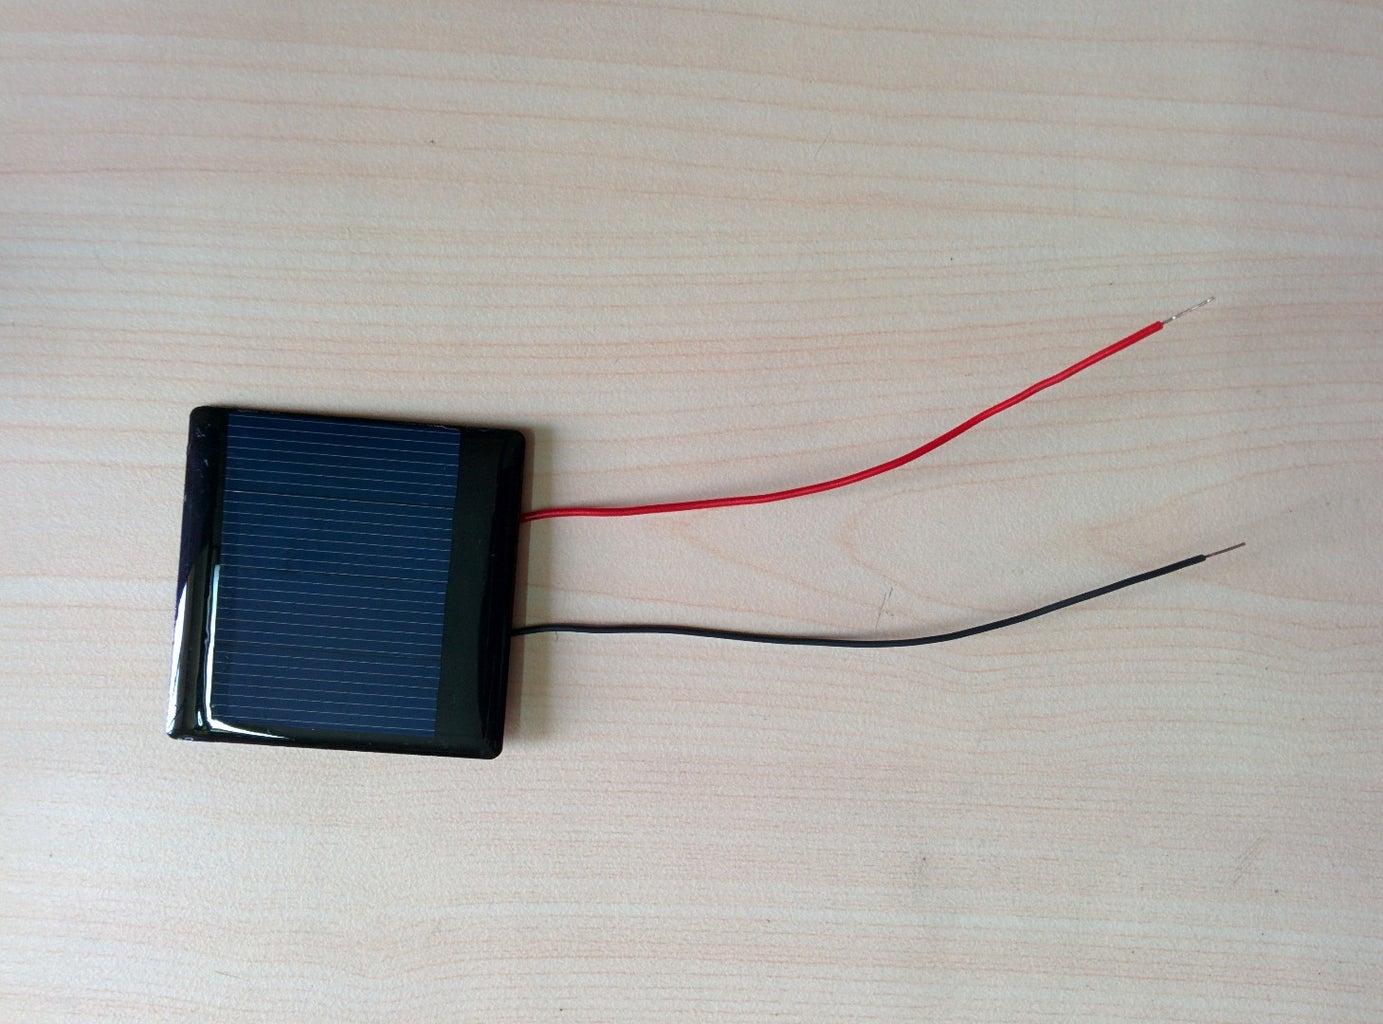 Solder the Solar Panel Terminals